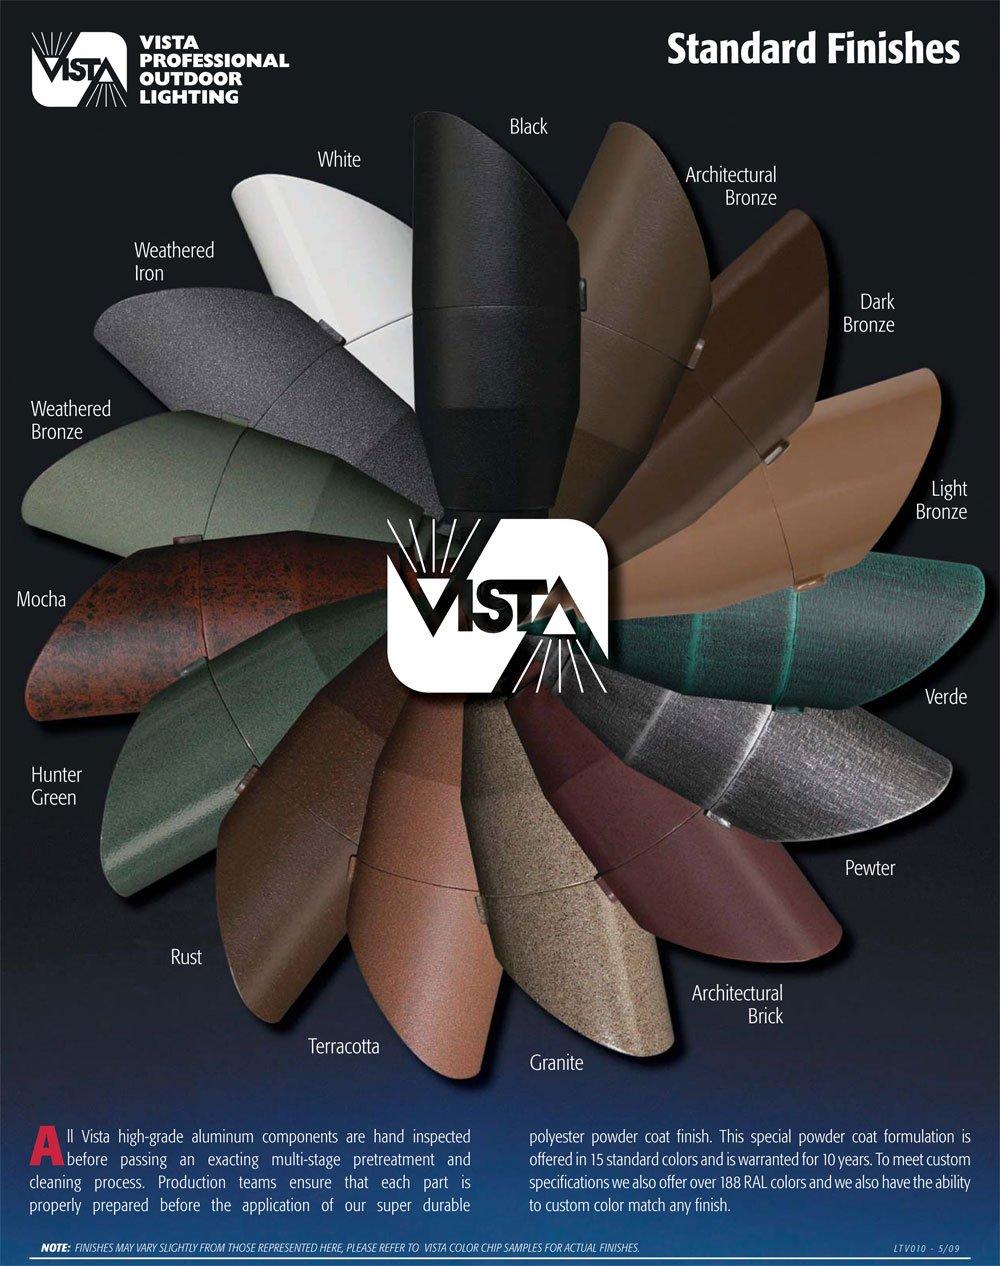 Amazon.com : Vista Pro Up and Accent Landscape Lighting GR 2216 ...